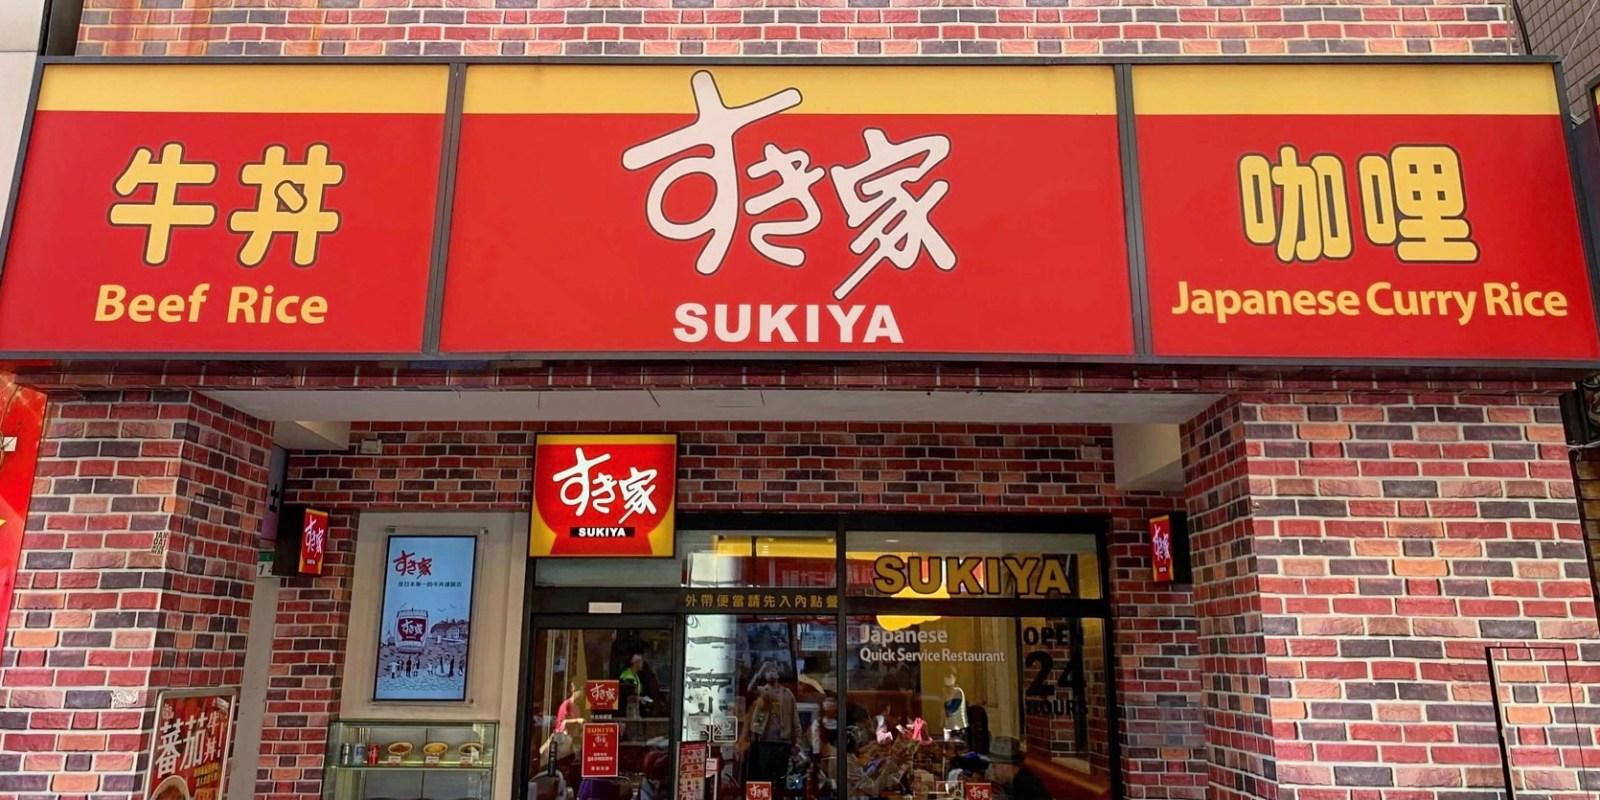 すき家(Sukiya)的2021年外送、外帶、菜單、優惠、最新品項和分店介紹(6月更新)